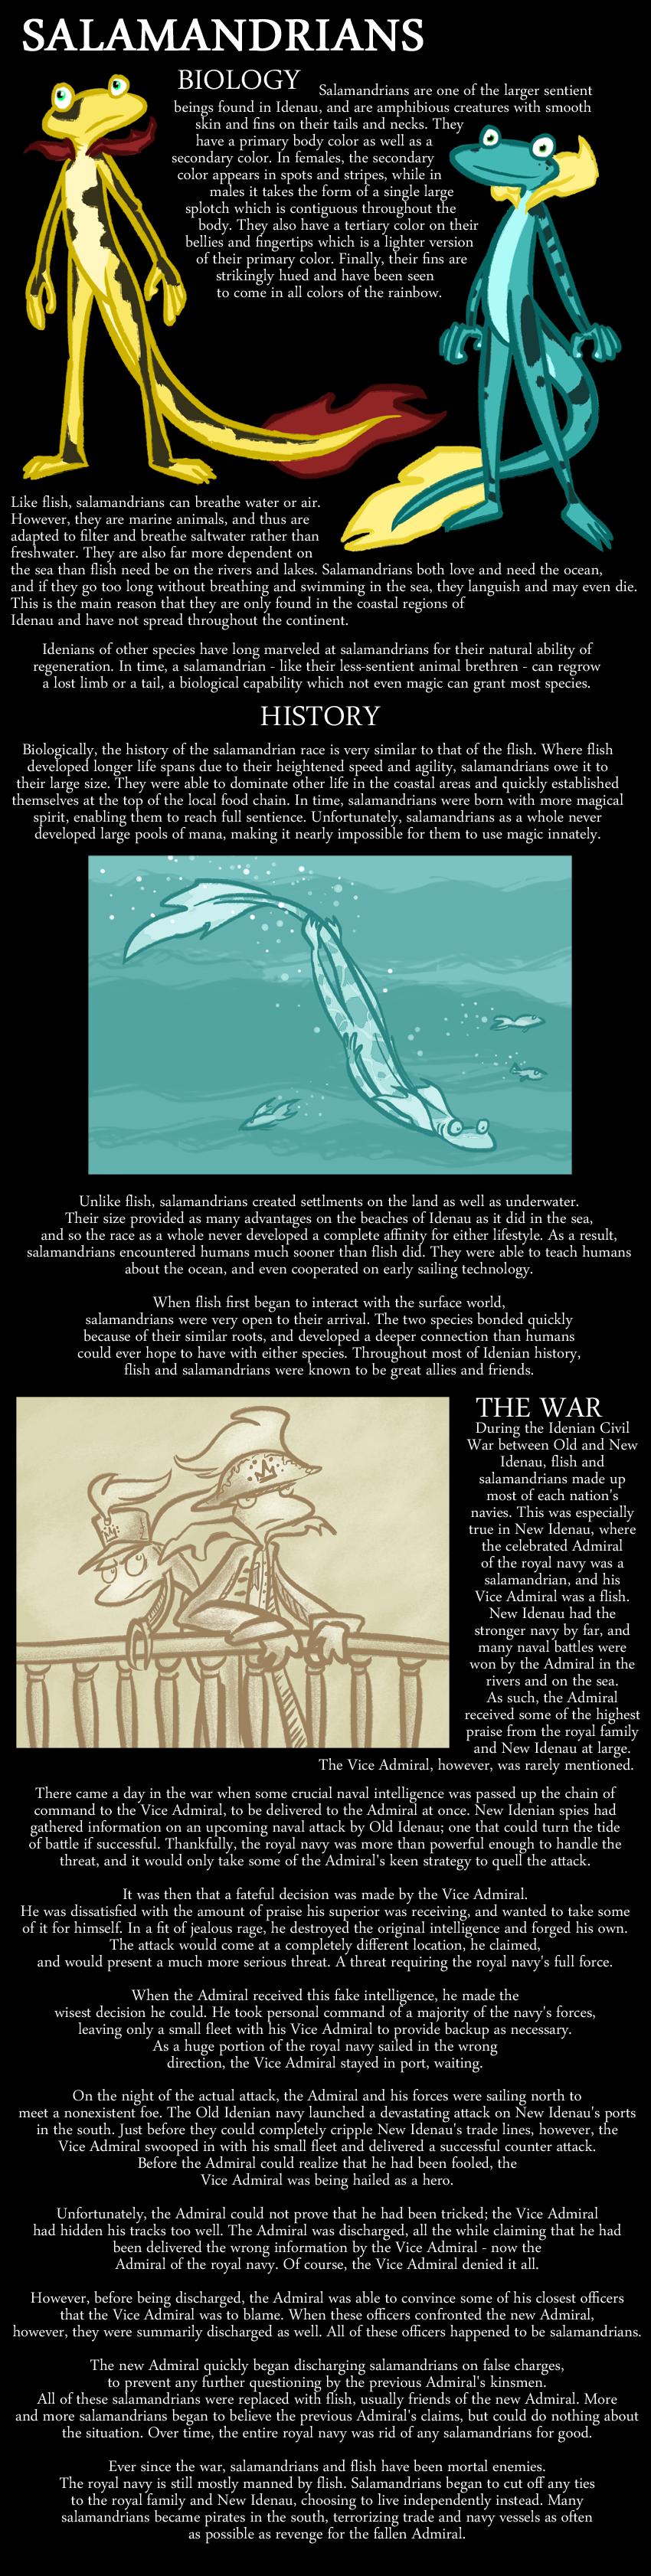 Encyclopedia of Idenau: Salamandrians